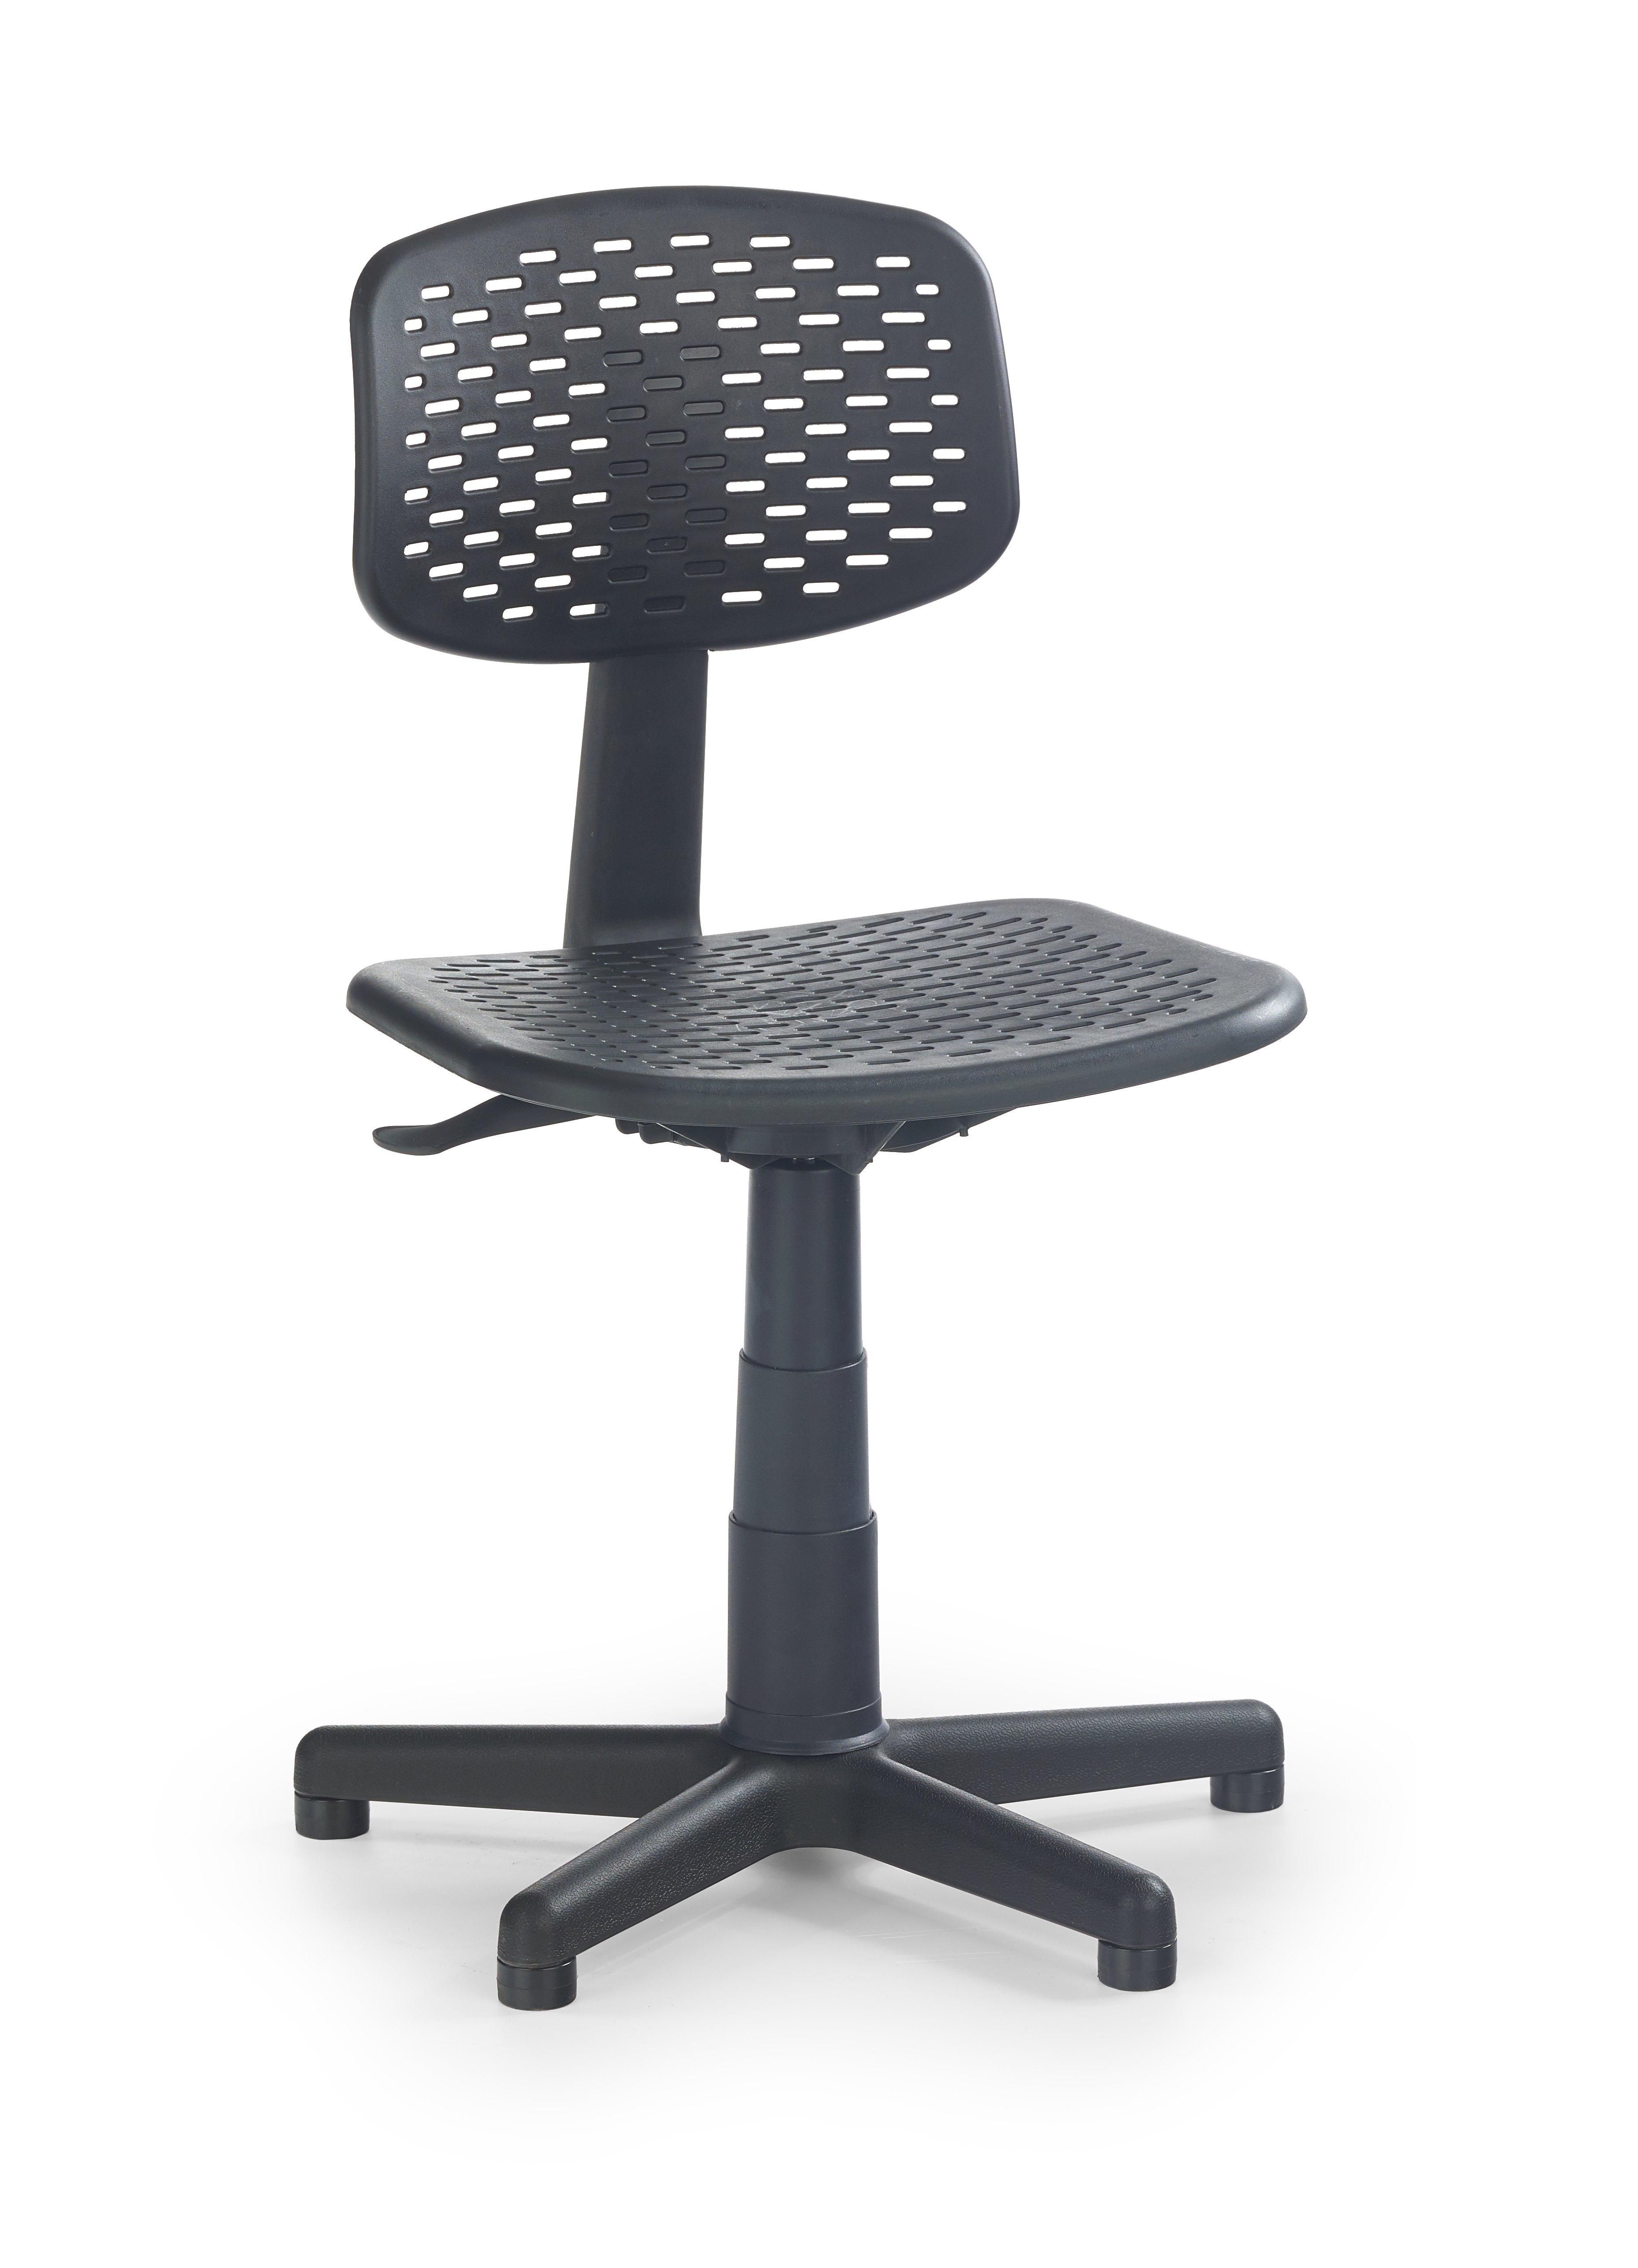 Dětská židle - Halmar - Loco